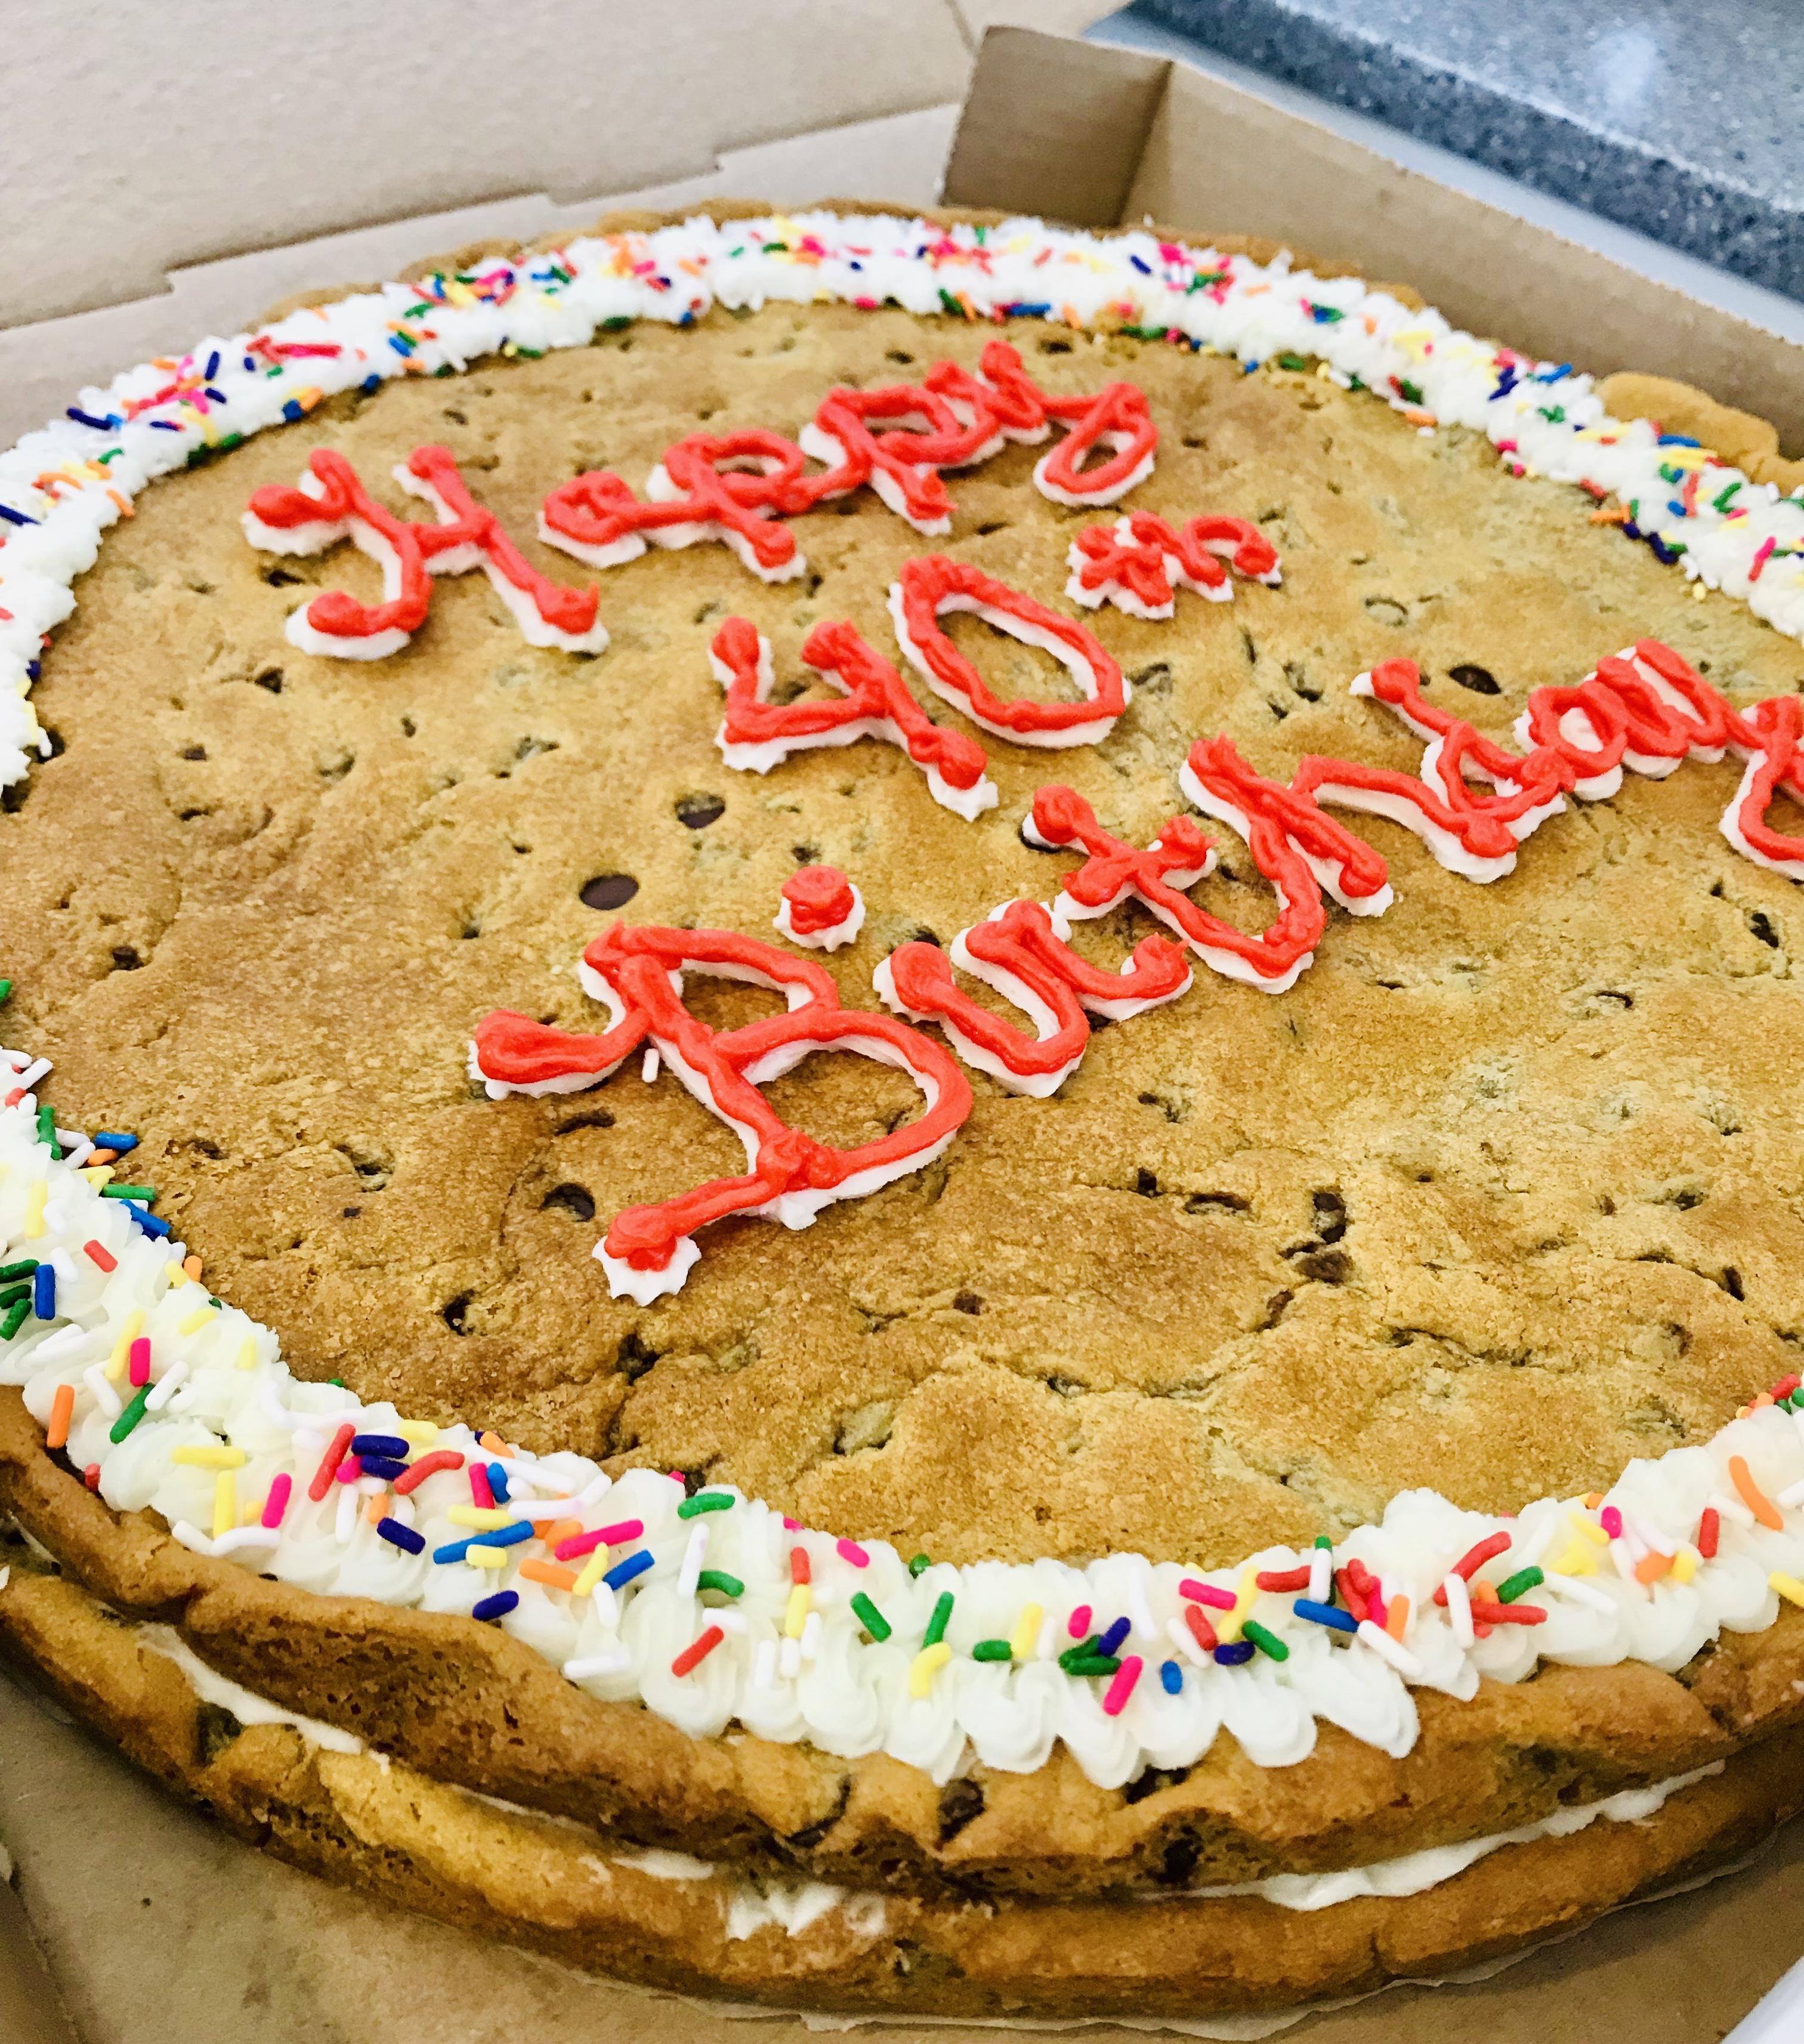 https://0201.nccdn.net/4_2/000/000/000/397/sandwich-cake.jpg